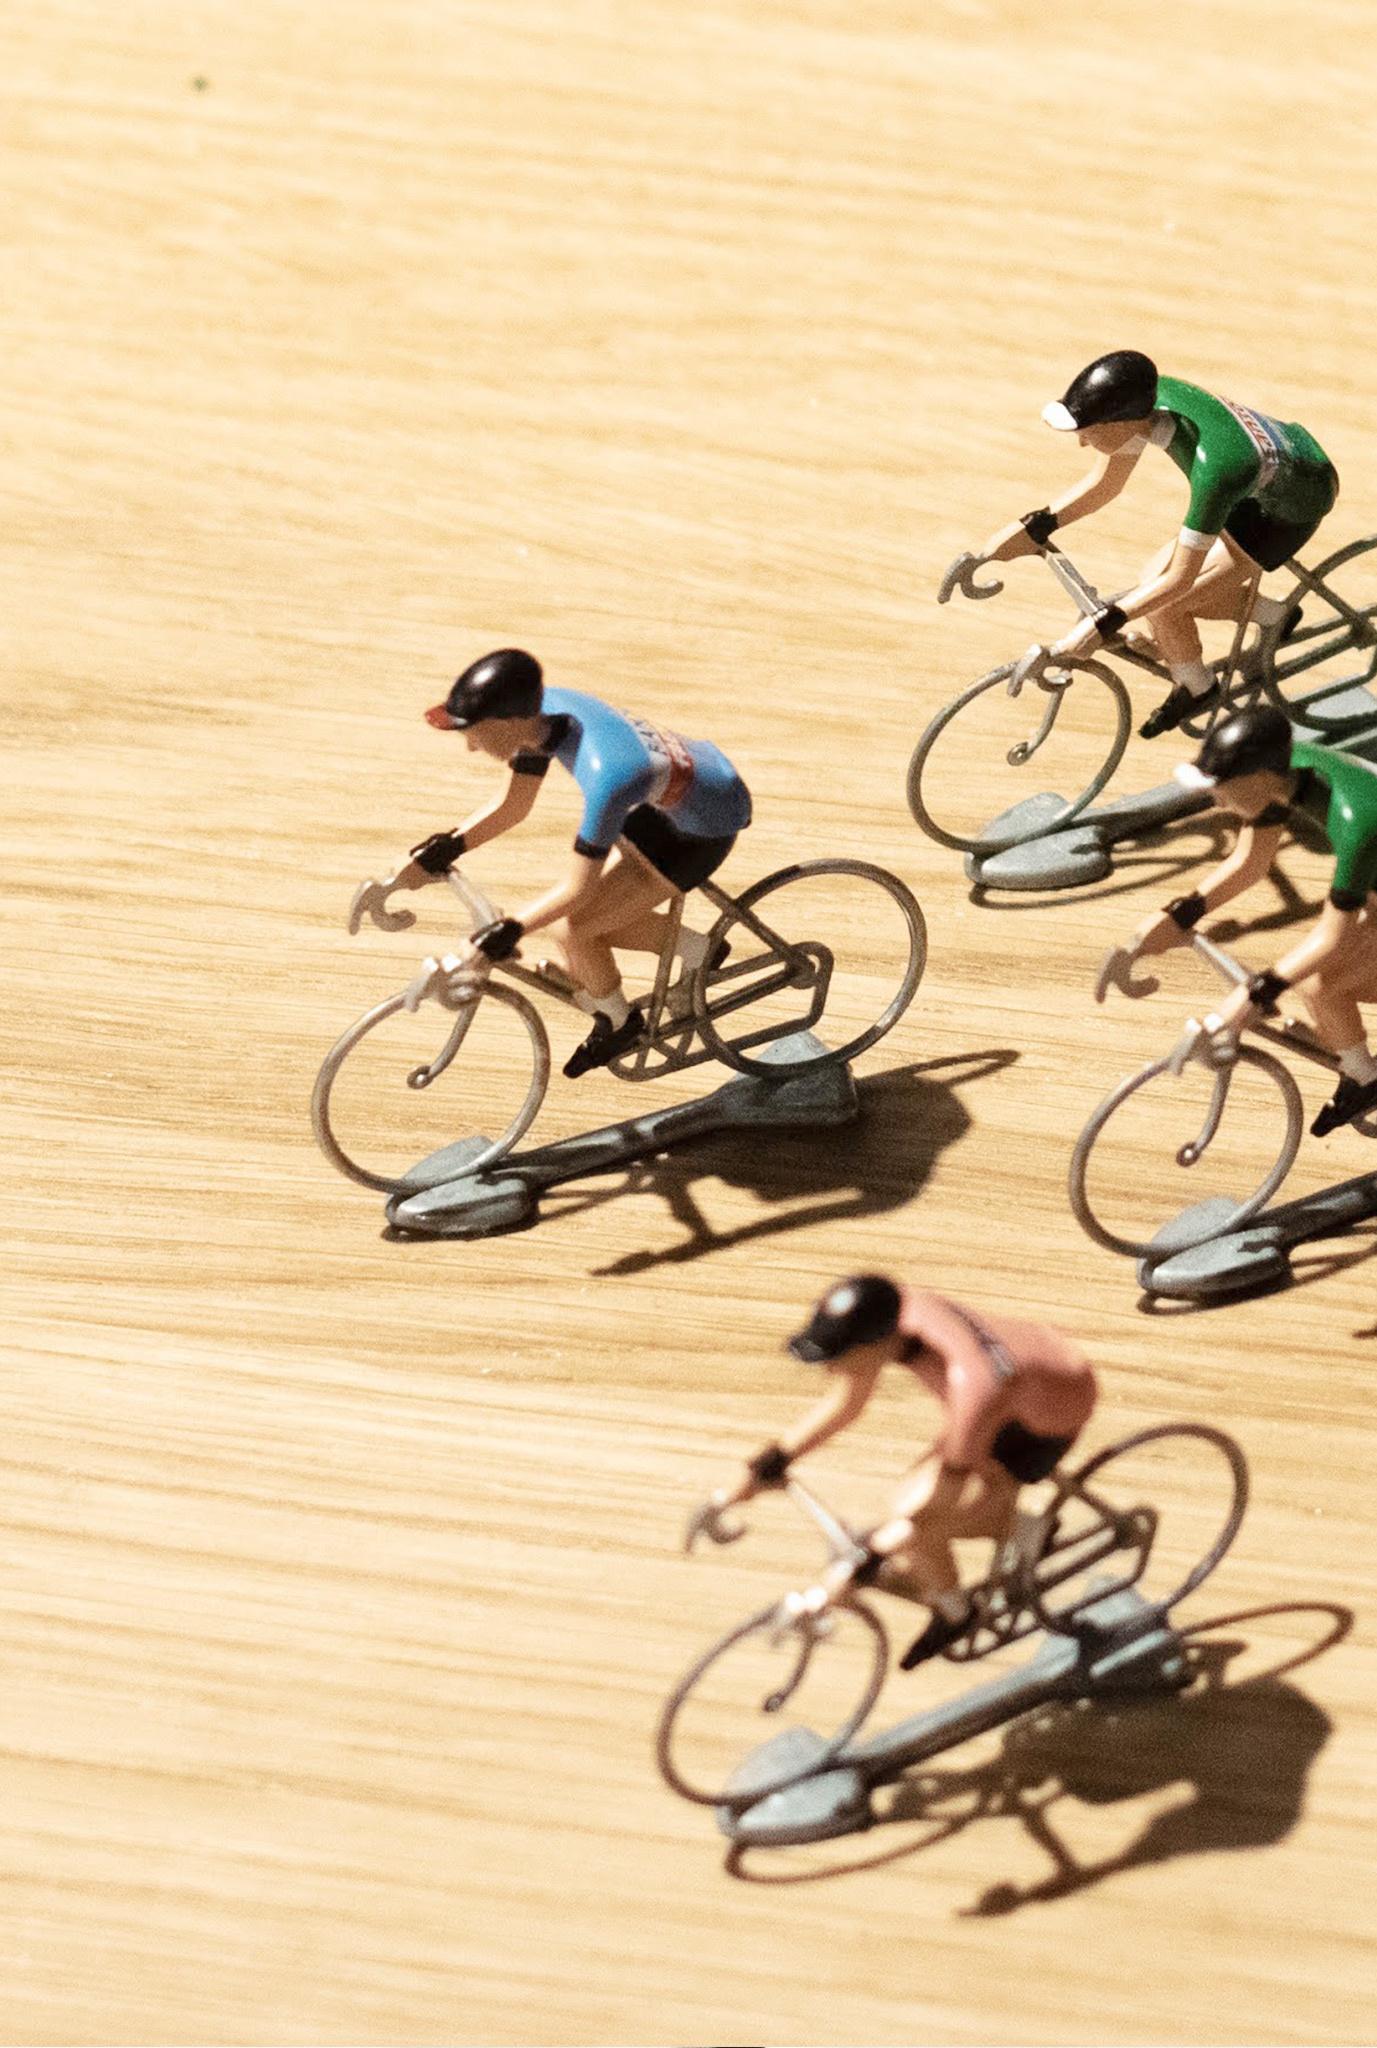 Miniatuur wielrenners - Cycling hero's 3 st (diverse varianten)-1